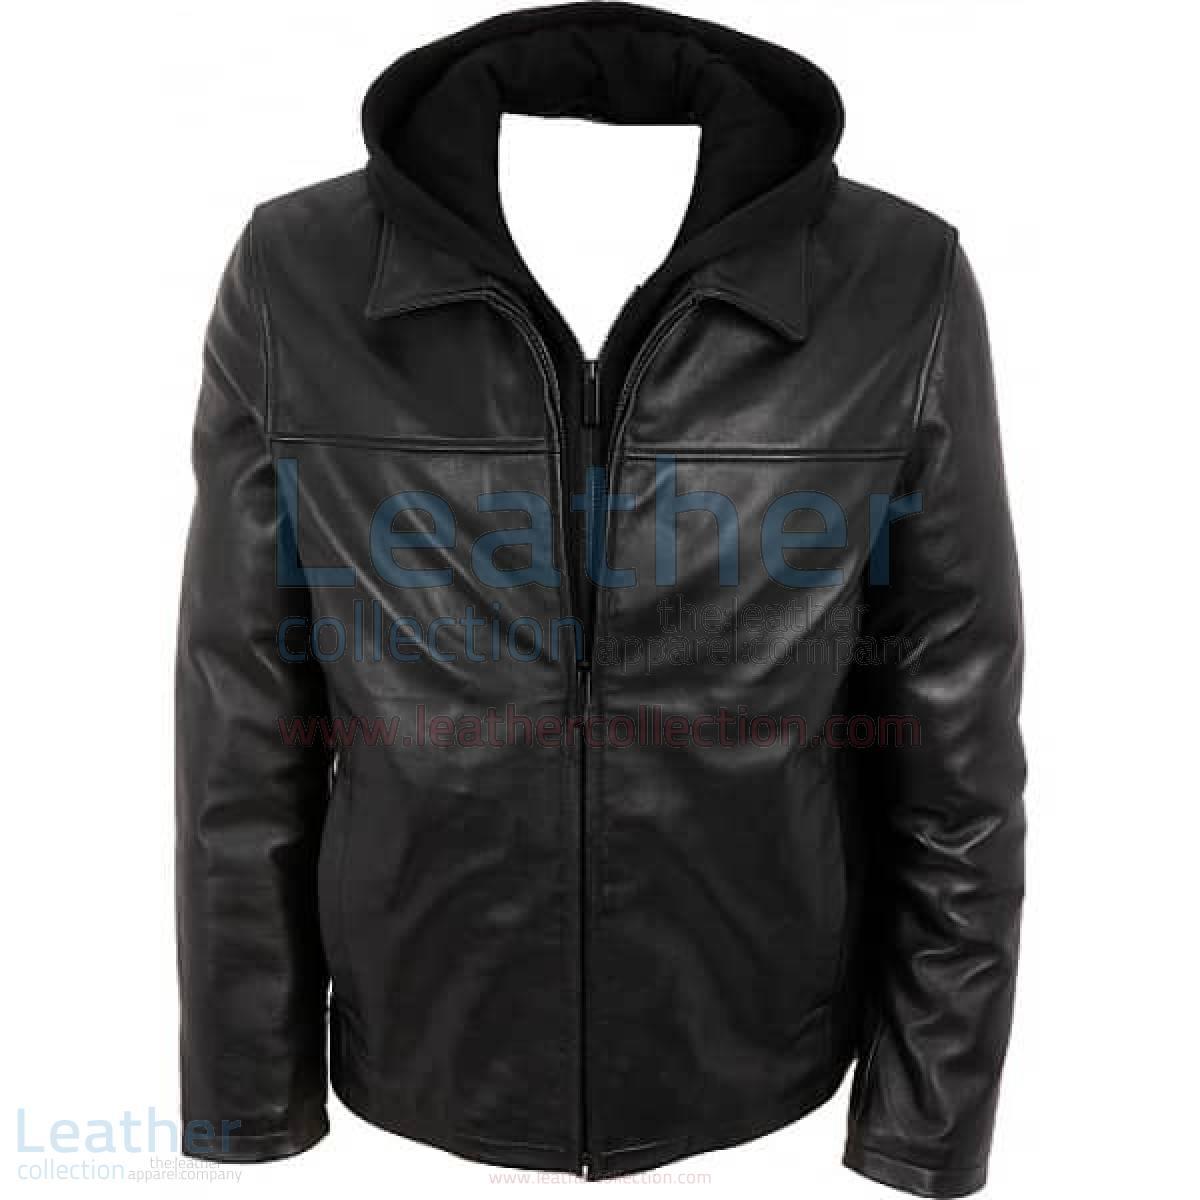 Leather Casual Jacket with Hood –  Jacket